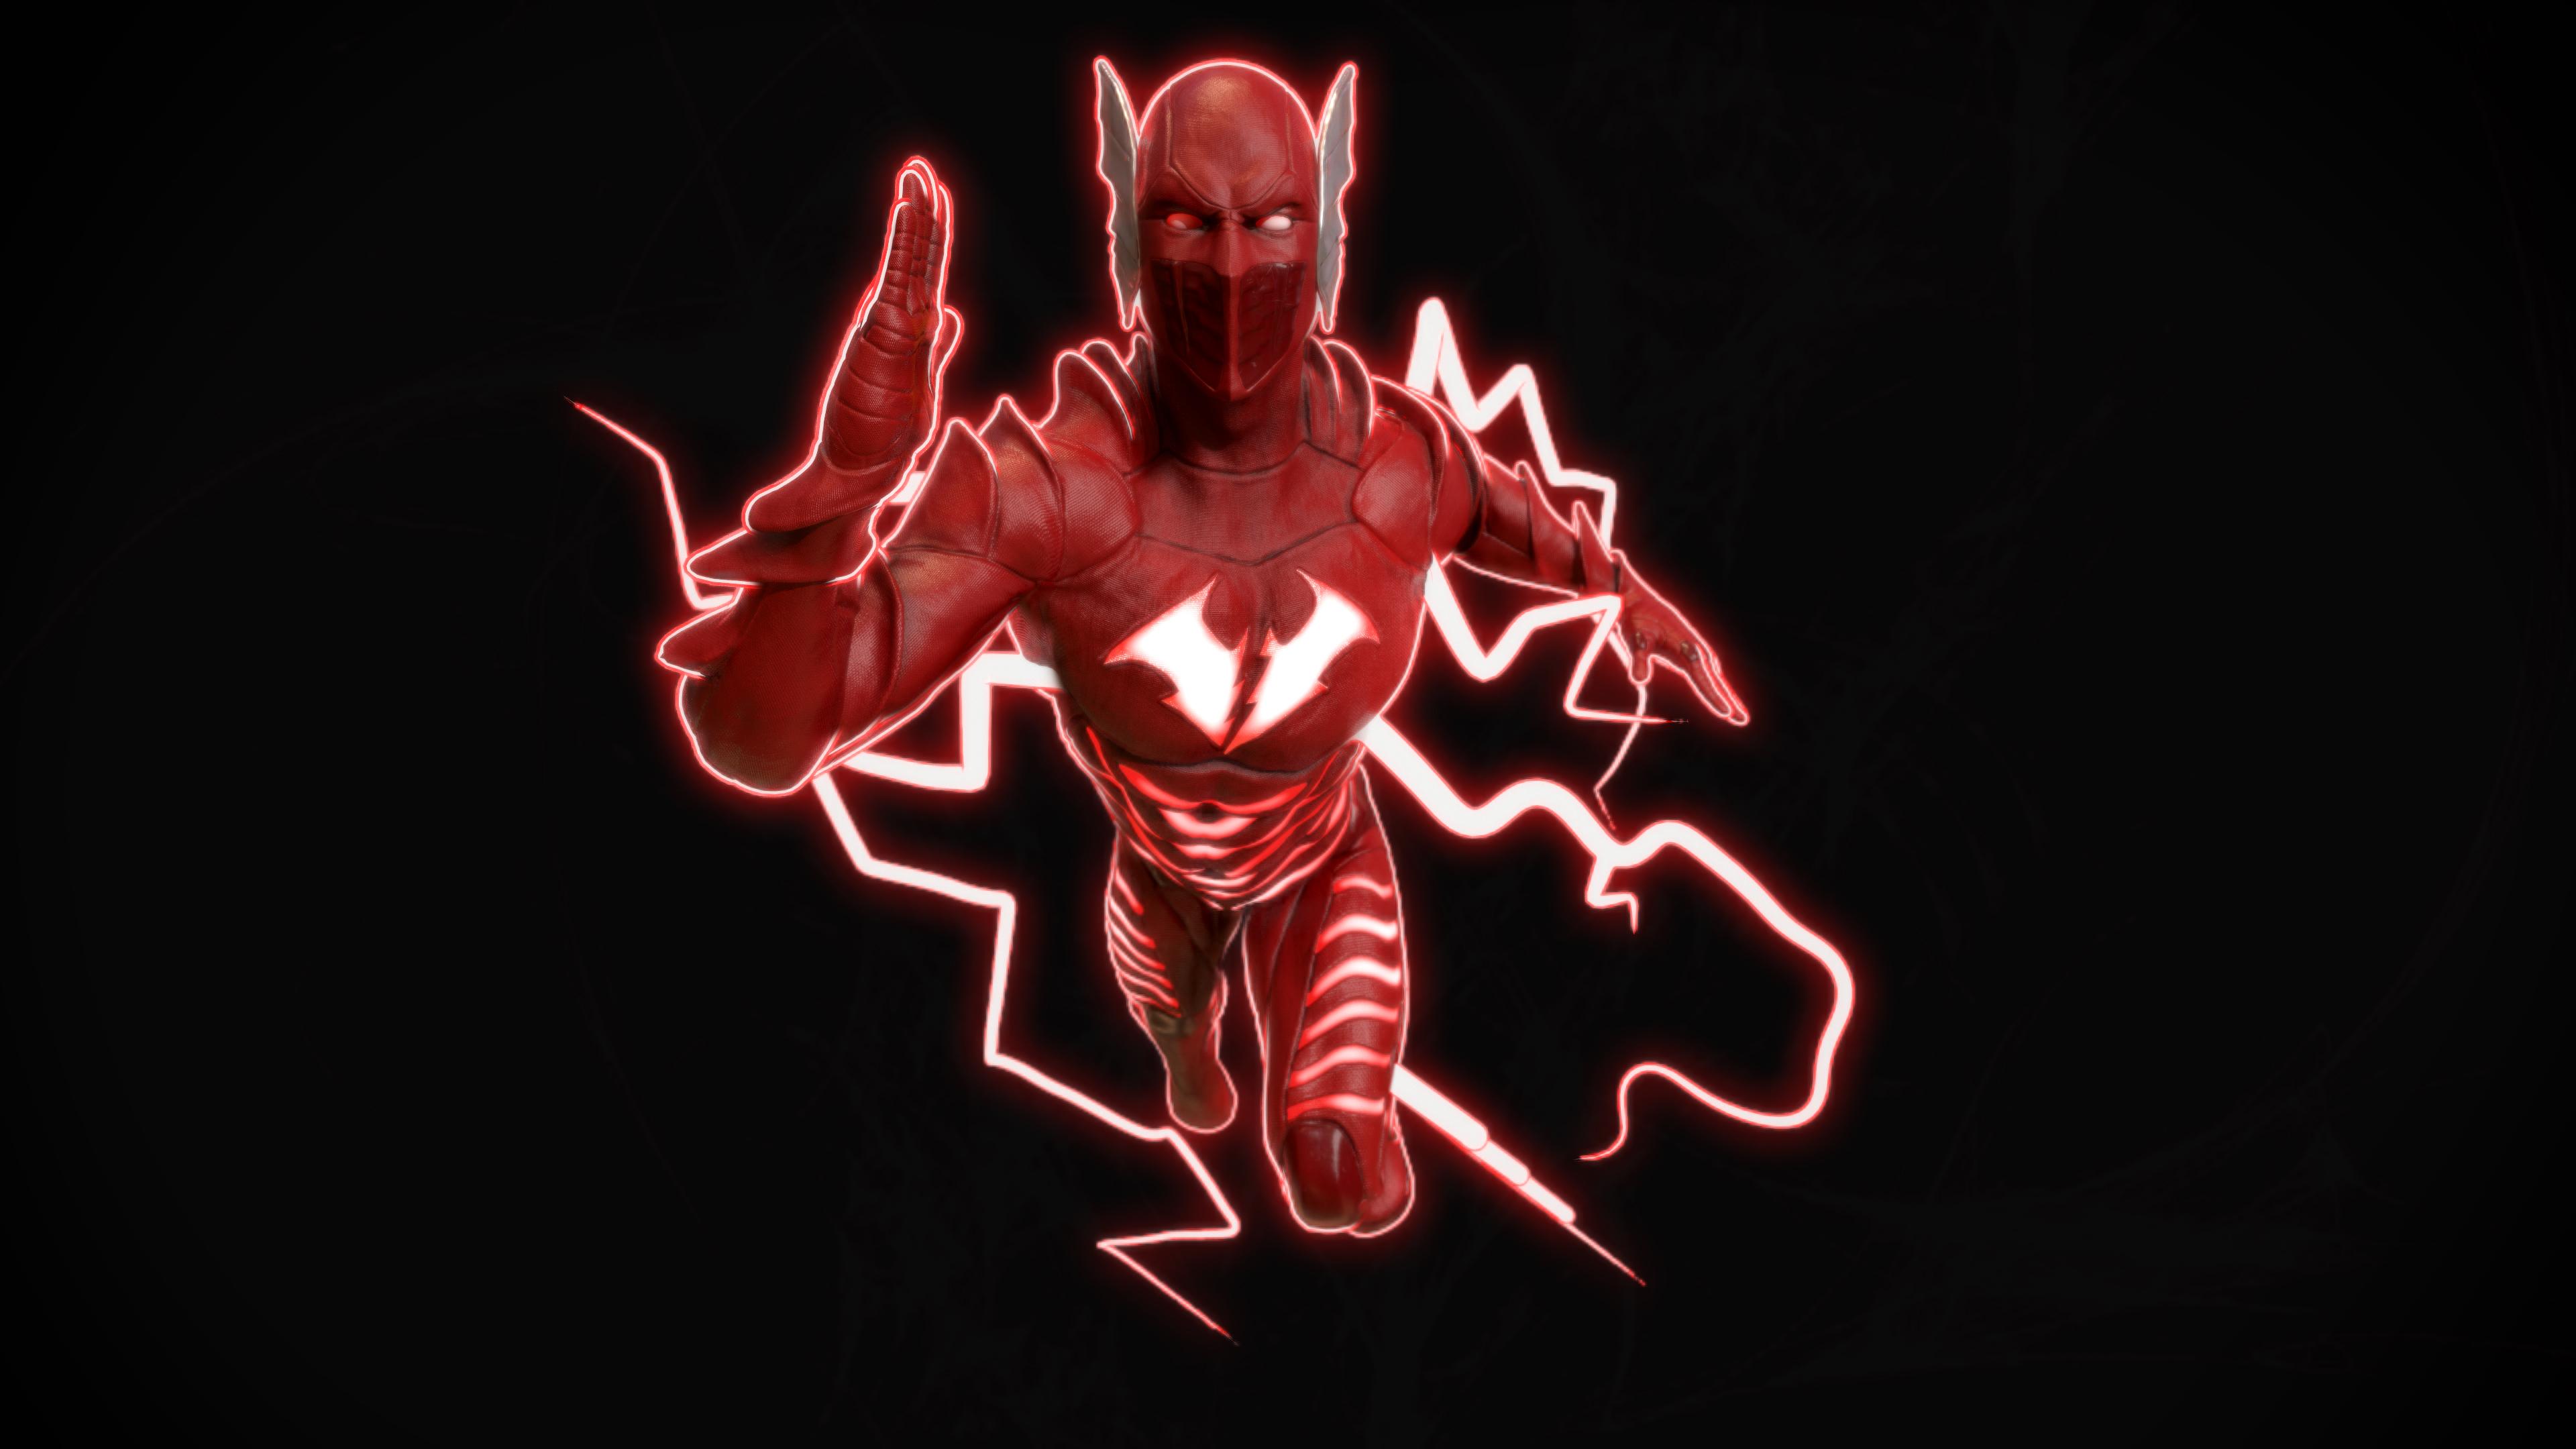 Batman Red Death